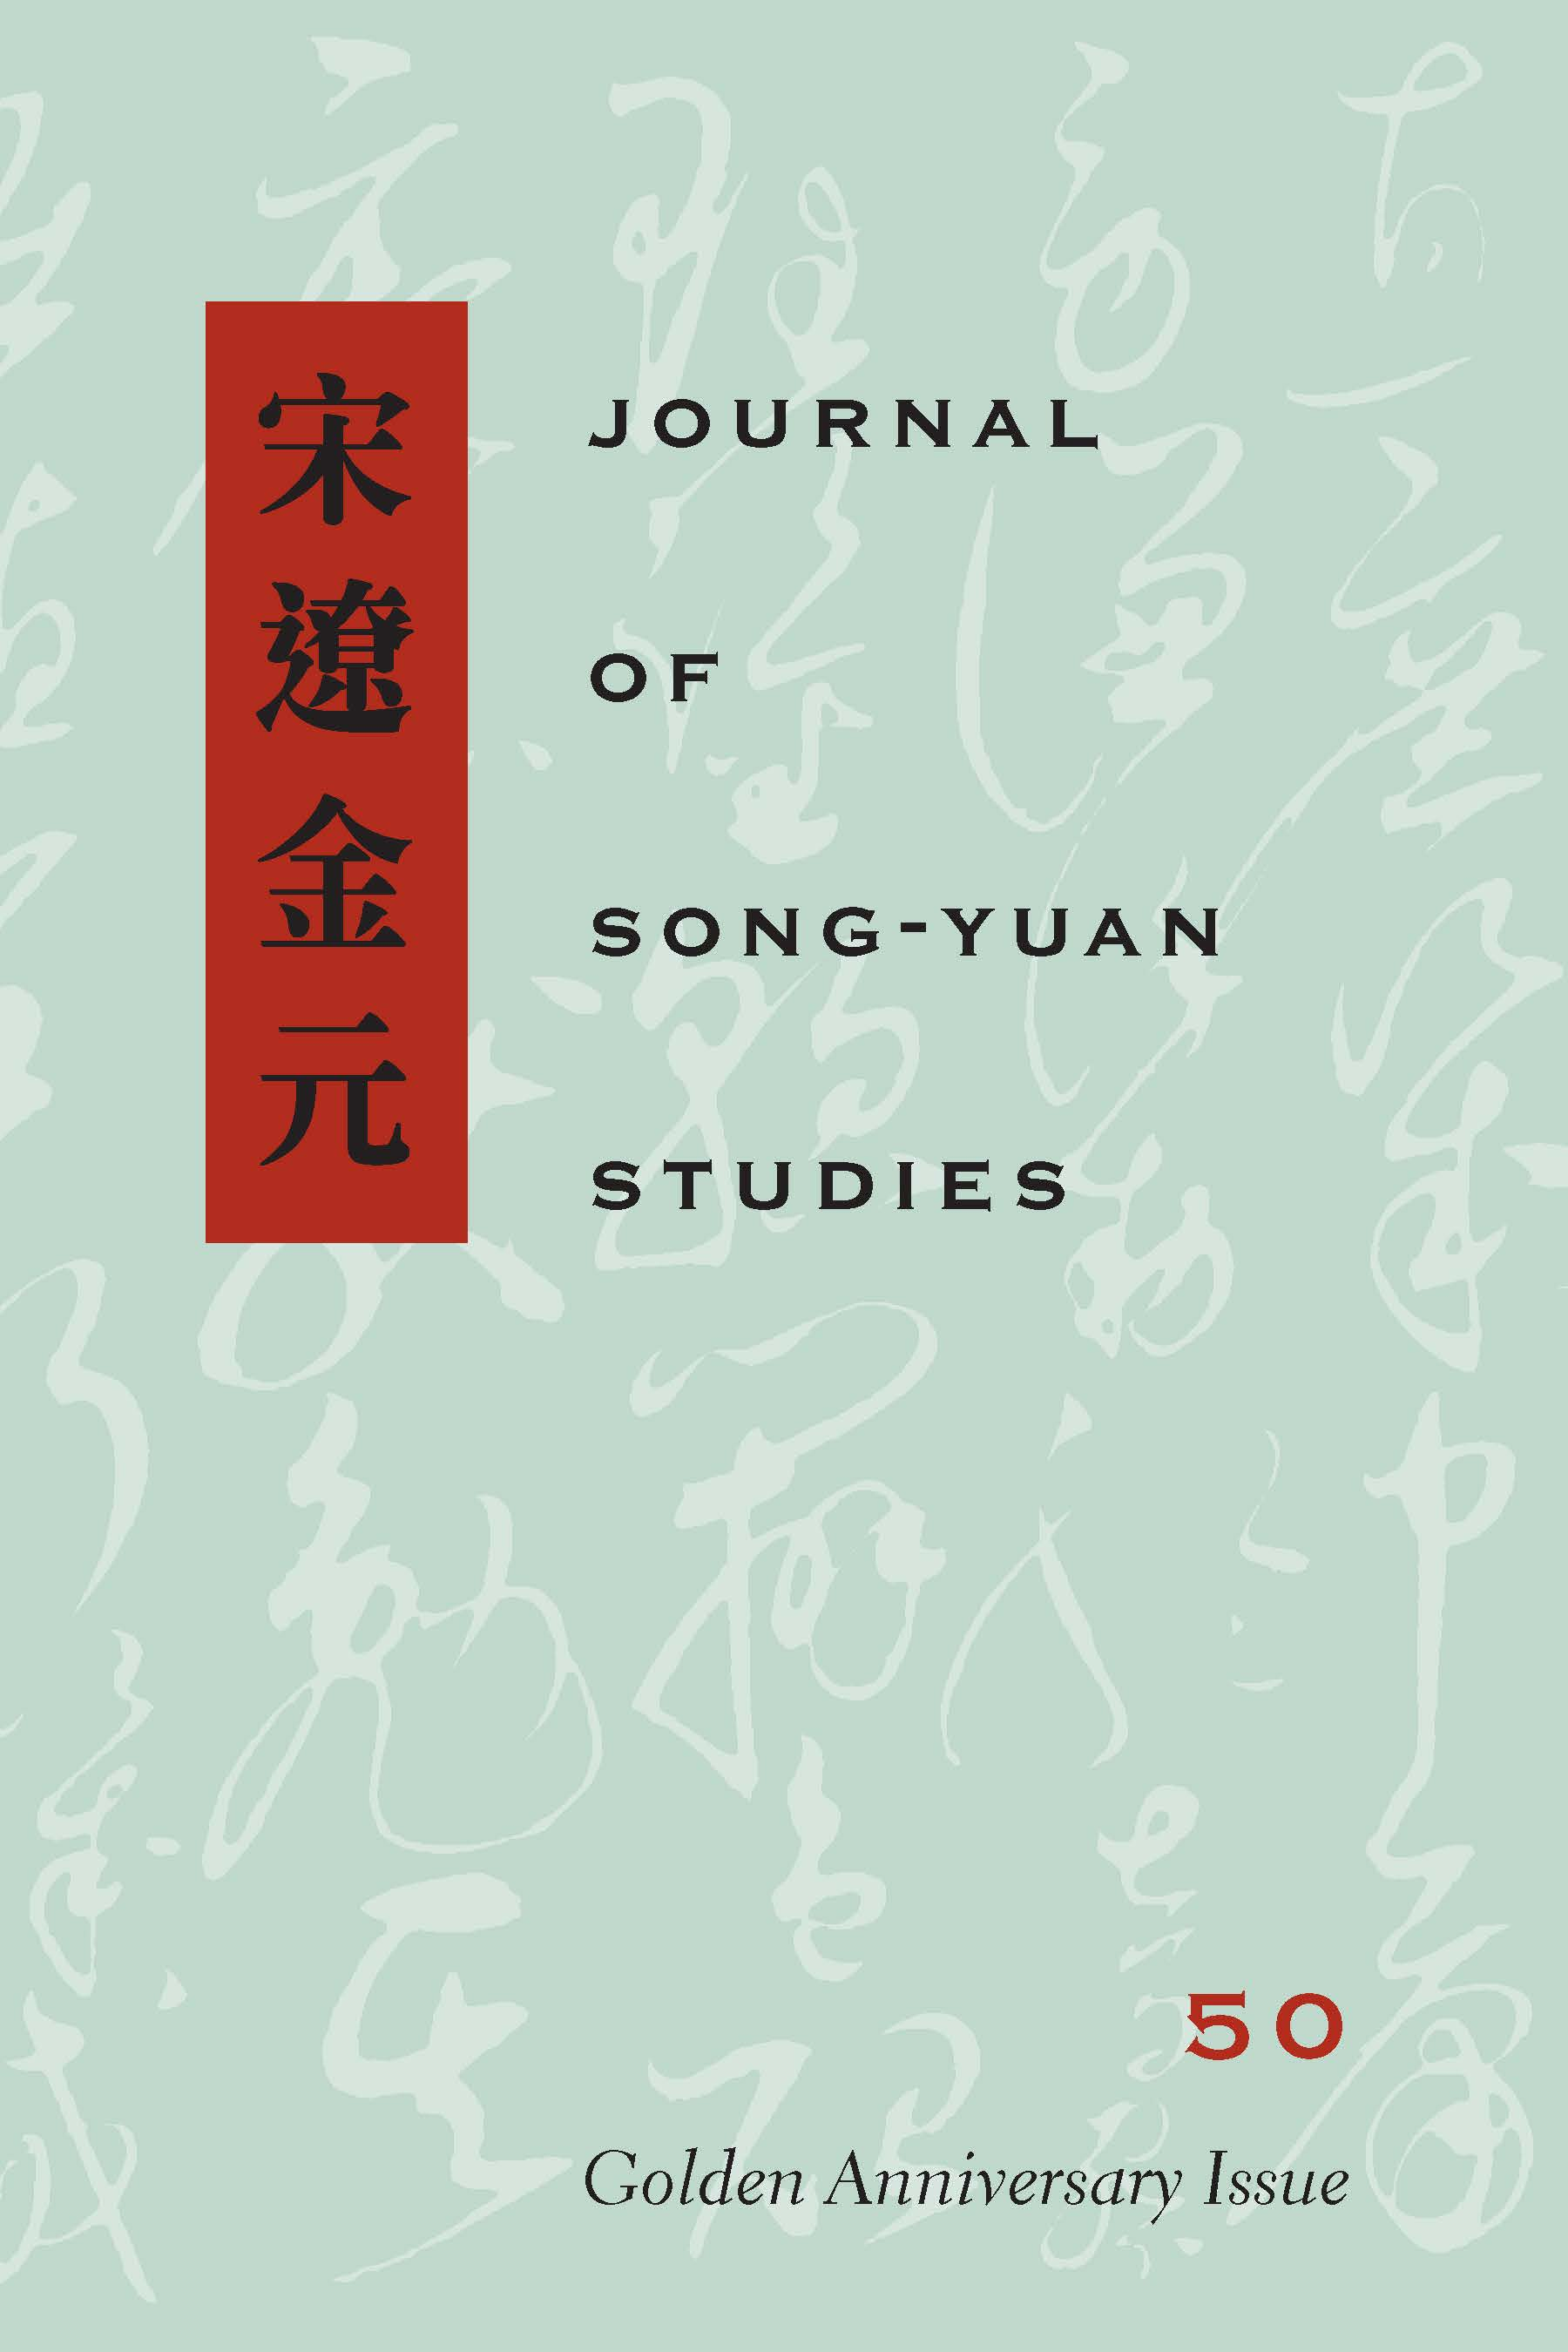 Journal of Song-Yuan Studies: Volume 50, 2021